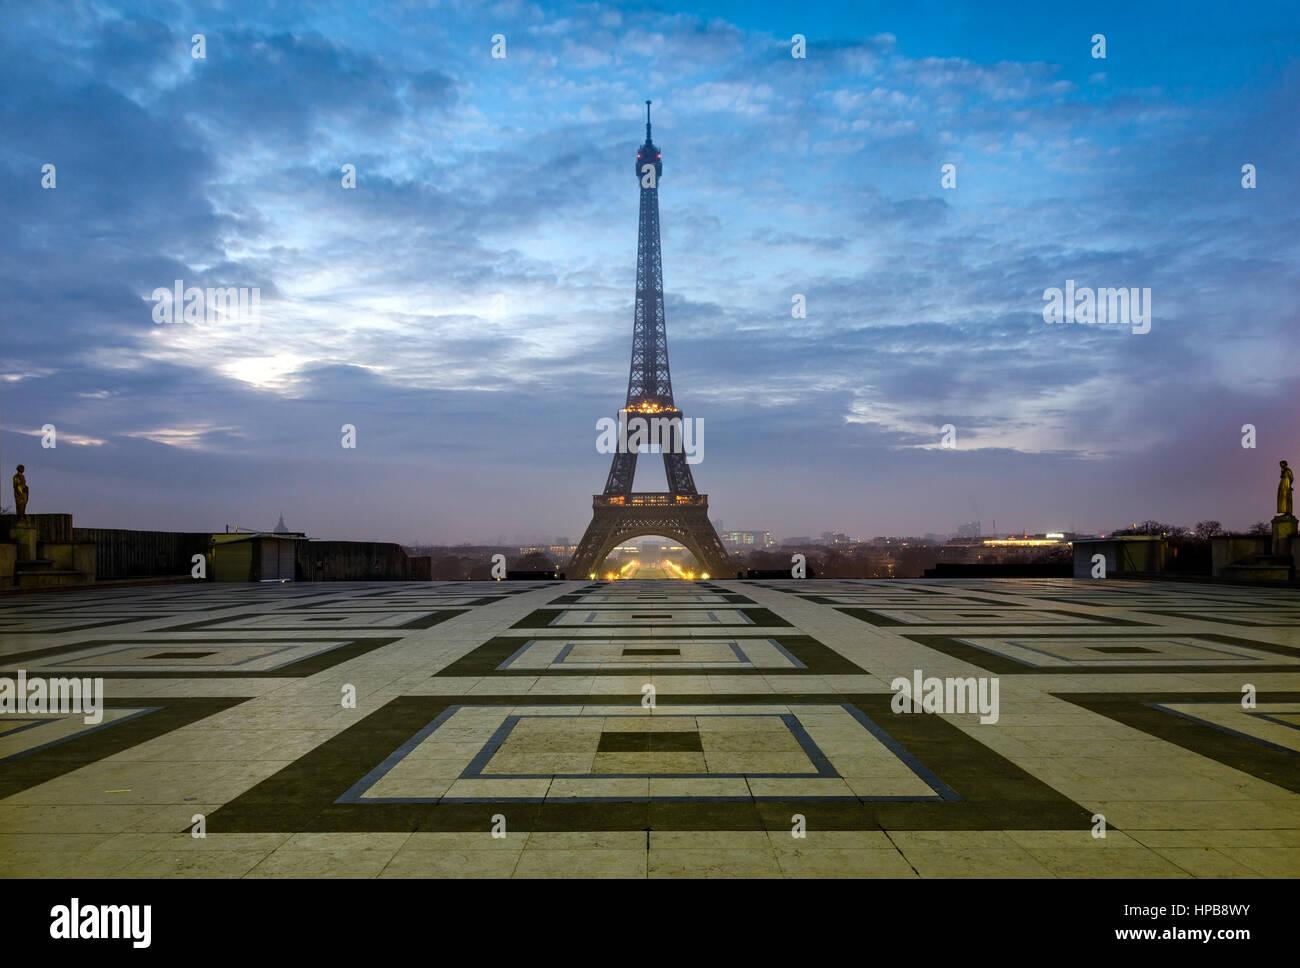 Paris Tour Eiffel from Trocadero at morning twilight - Stock Image